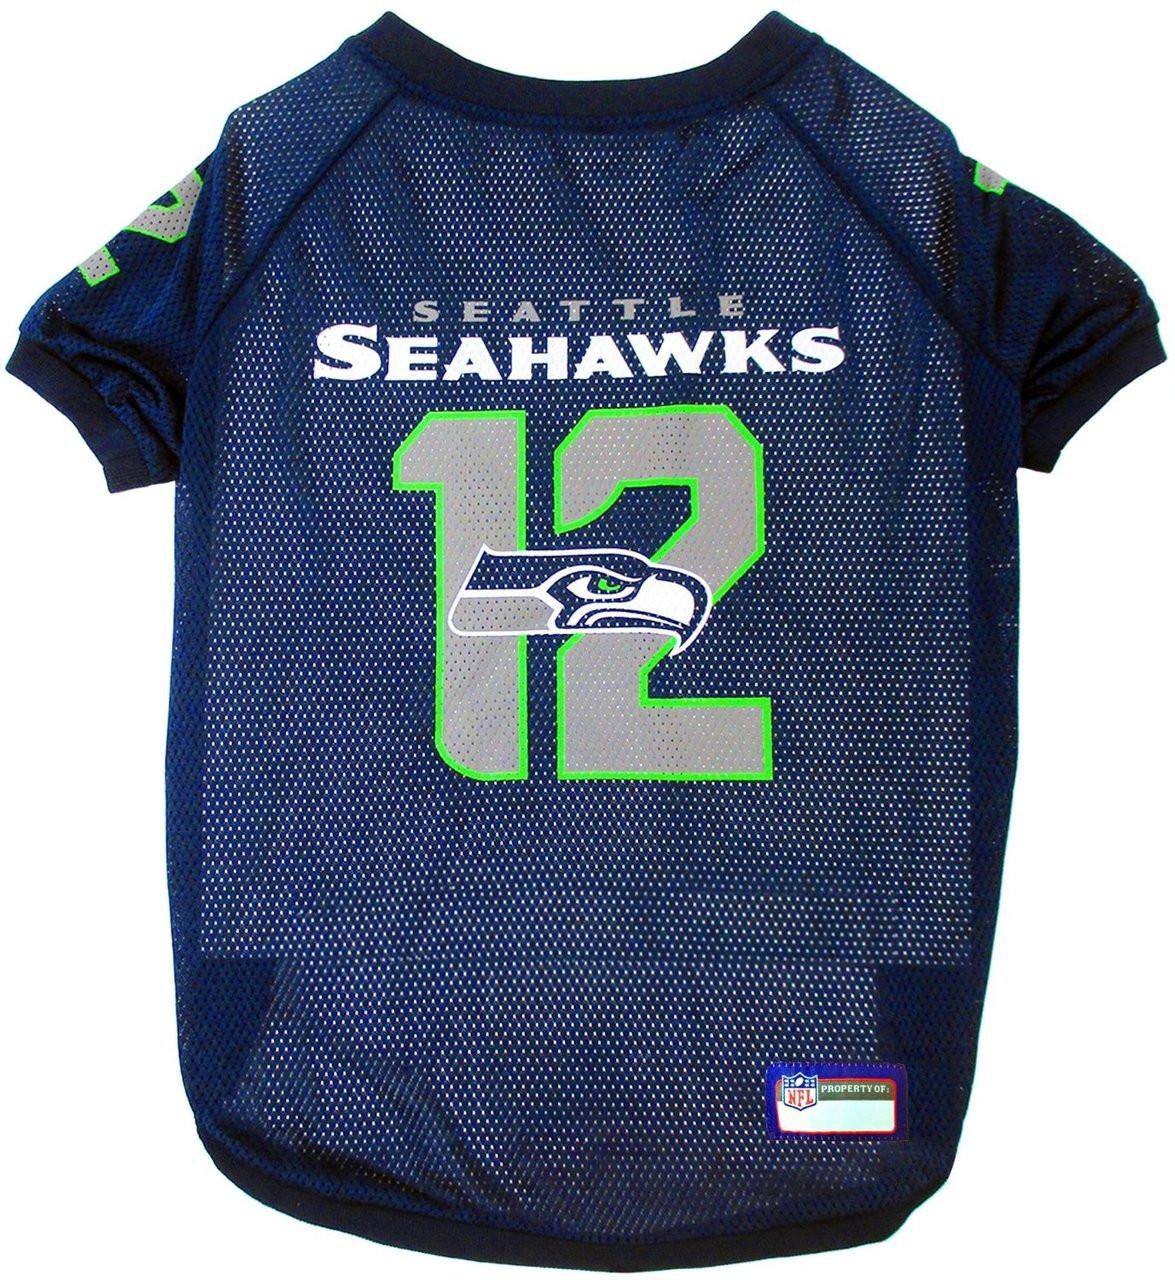 Seattle Seahawks NFL Pet Jersey - 12th Man   Hot Dog Collars